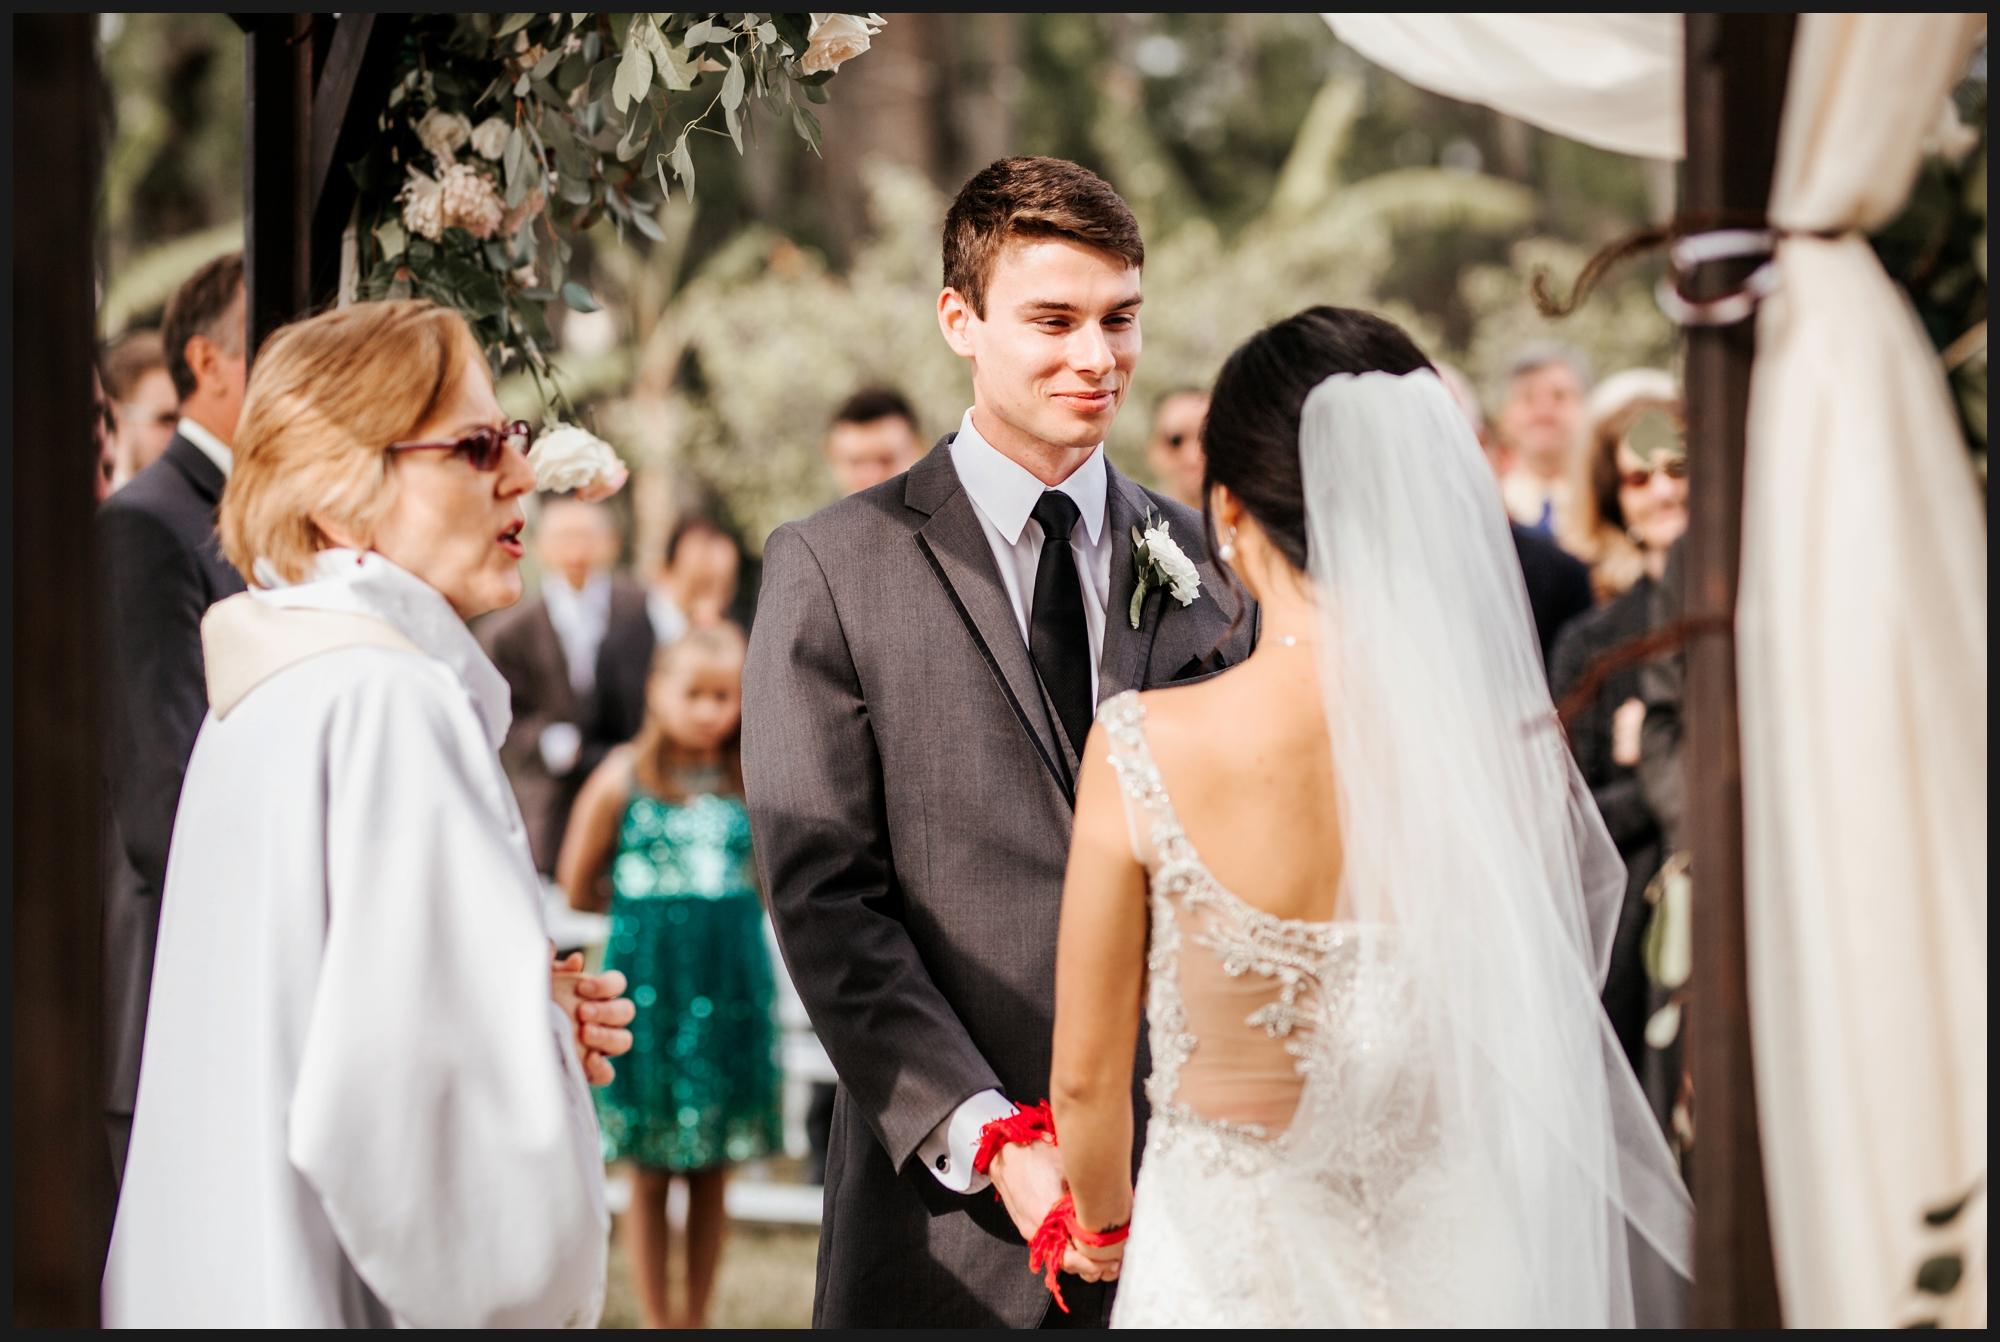 Orlando-Wedding-Photographer-destination-wedding-photographer-florida-wedding-photographer-bohemian-wedding-photographer_1426.jpg